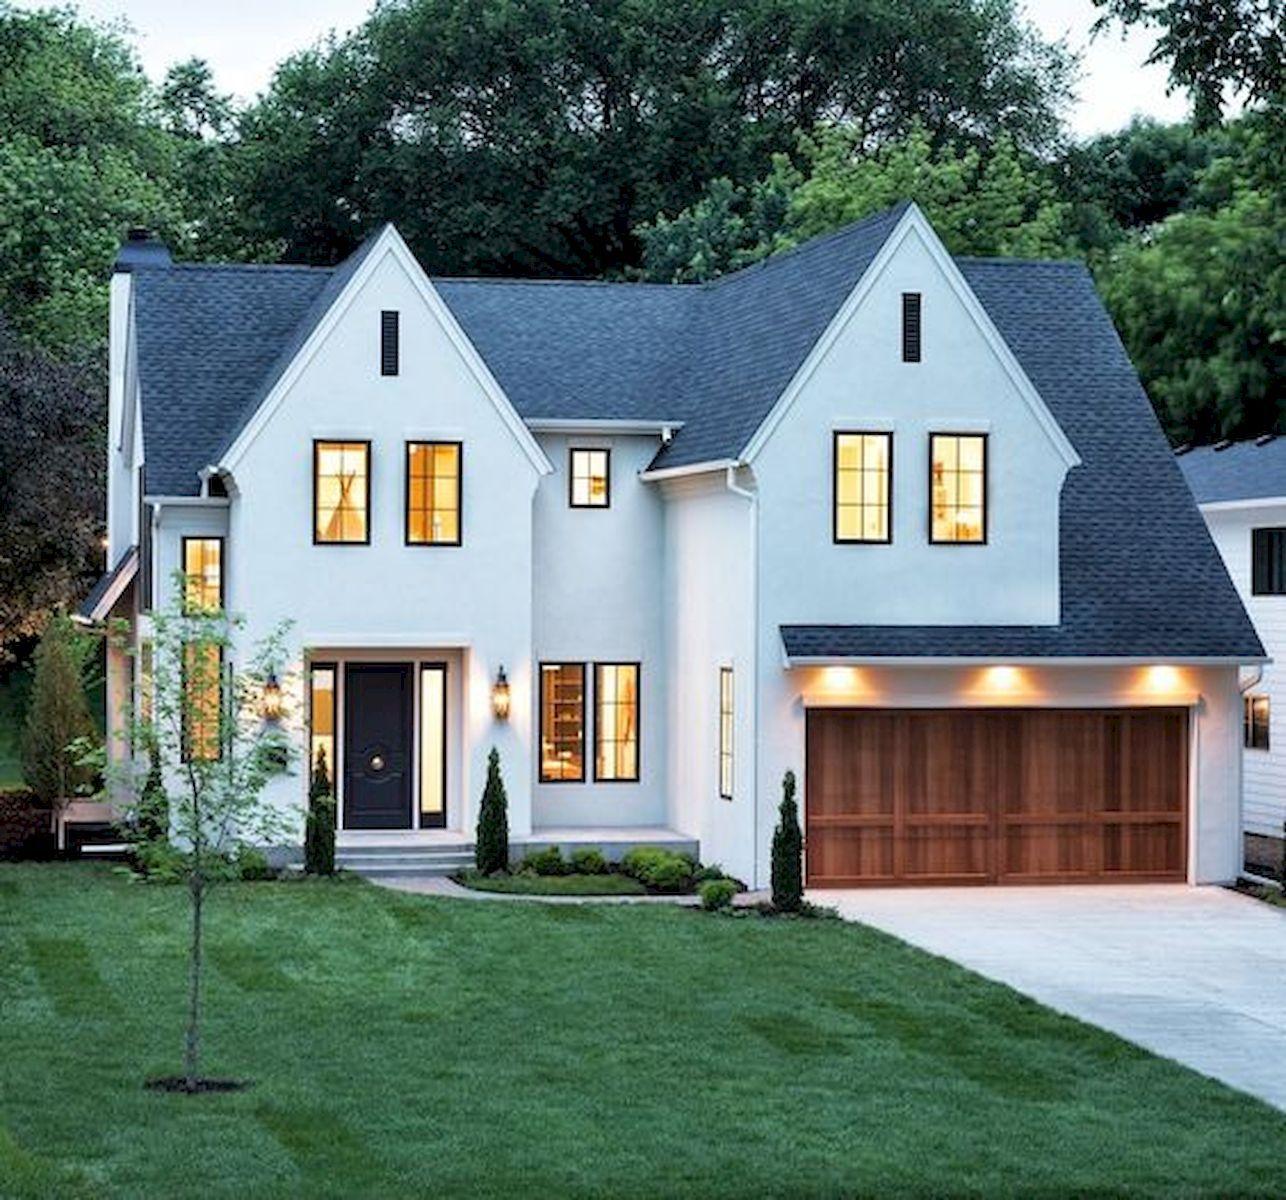 Home Design Ideas 2019: 33 Best Modern Farmhouse Exterior House Plans Design Ideas